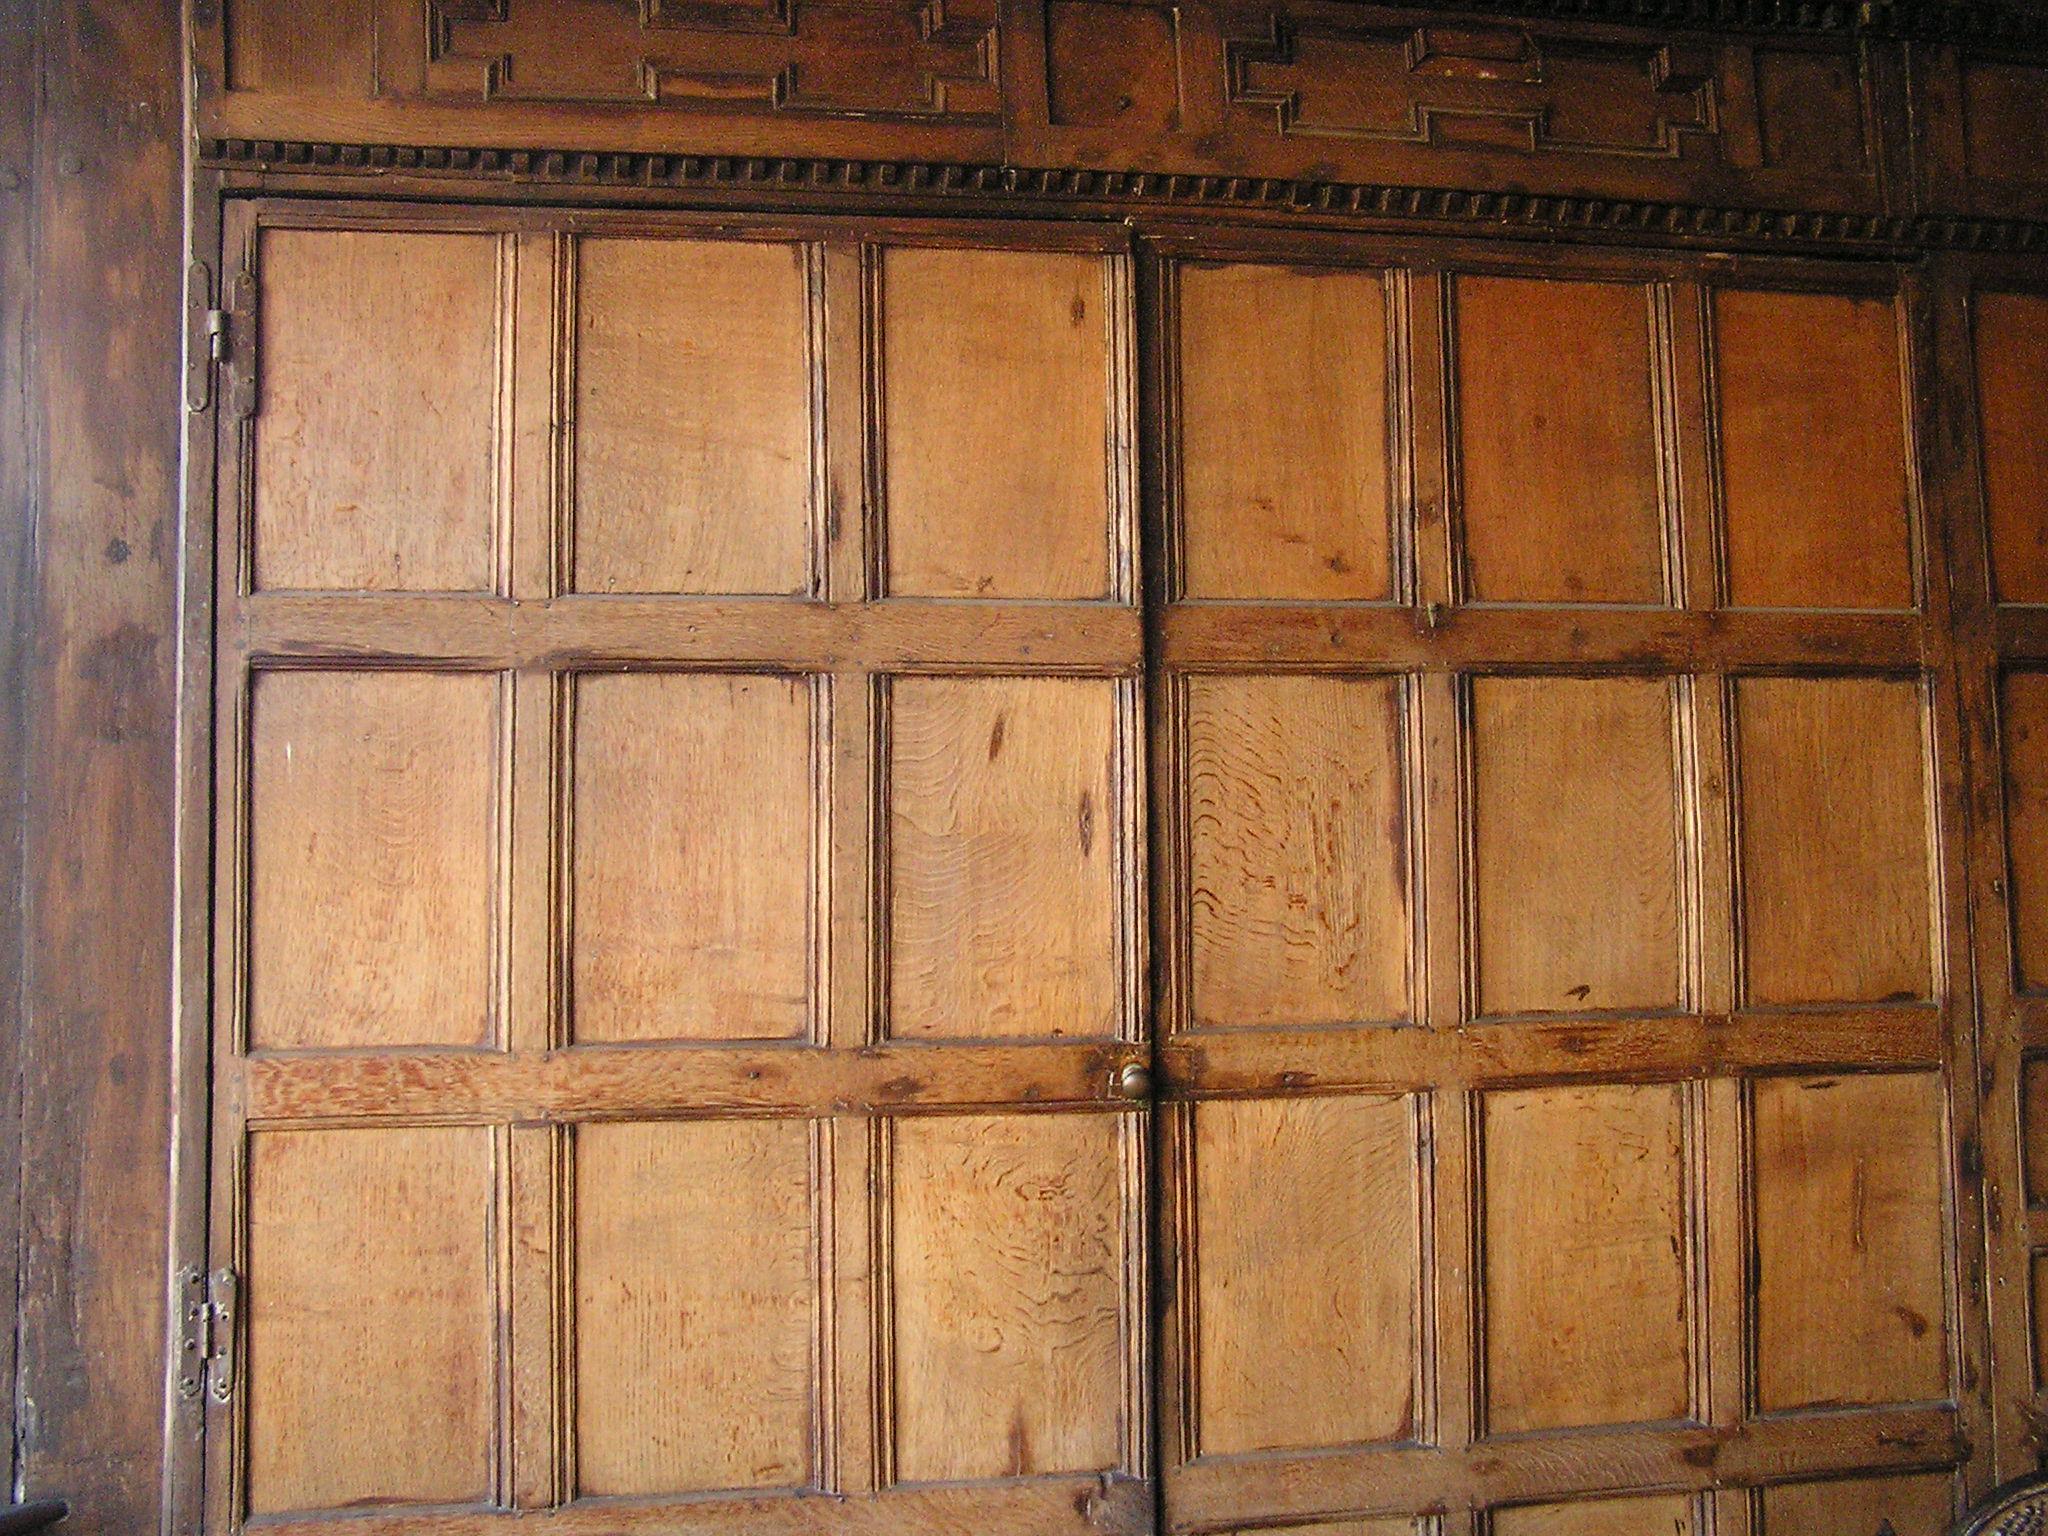 wainscot, Merchant's House, Wiltshire